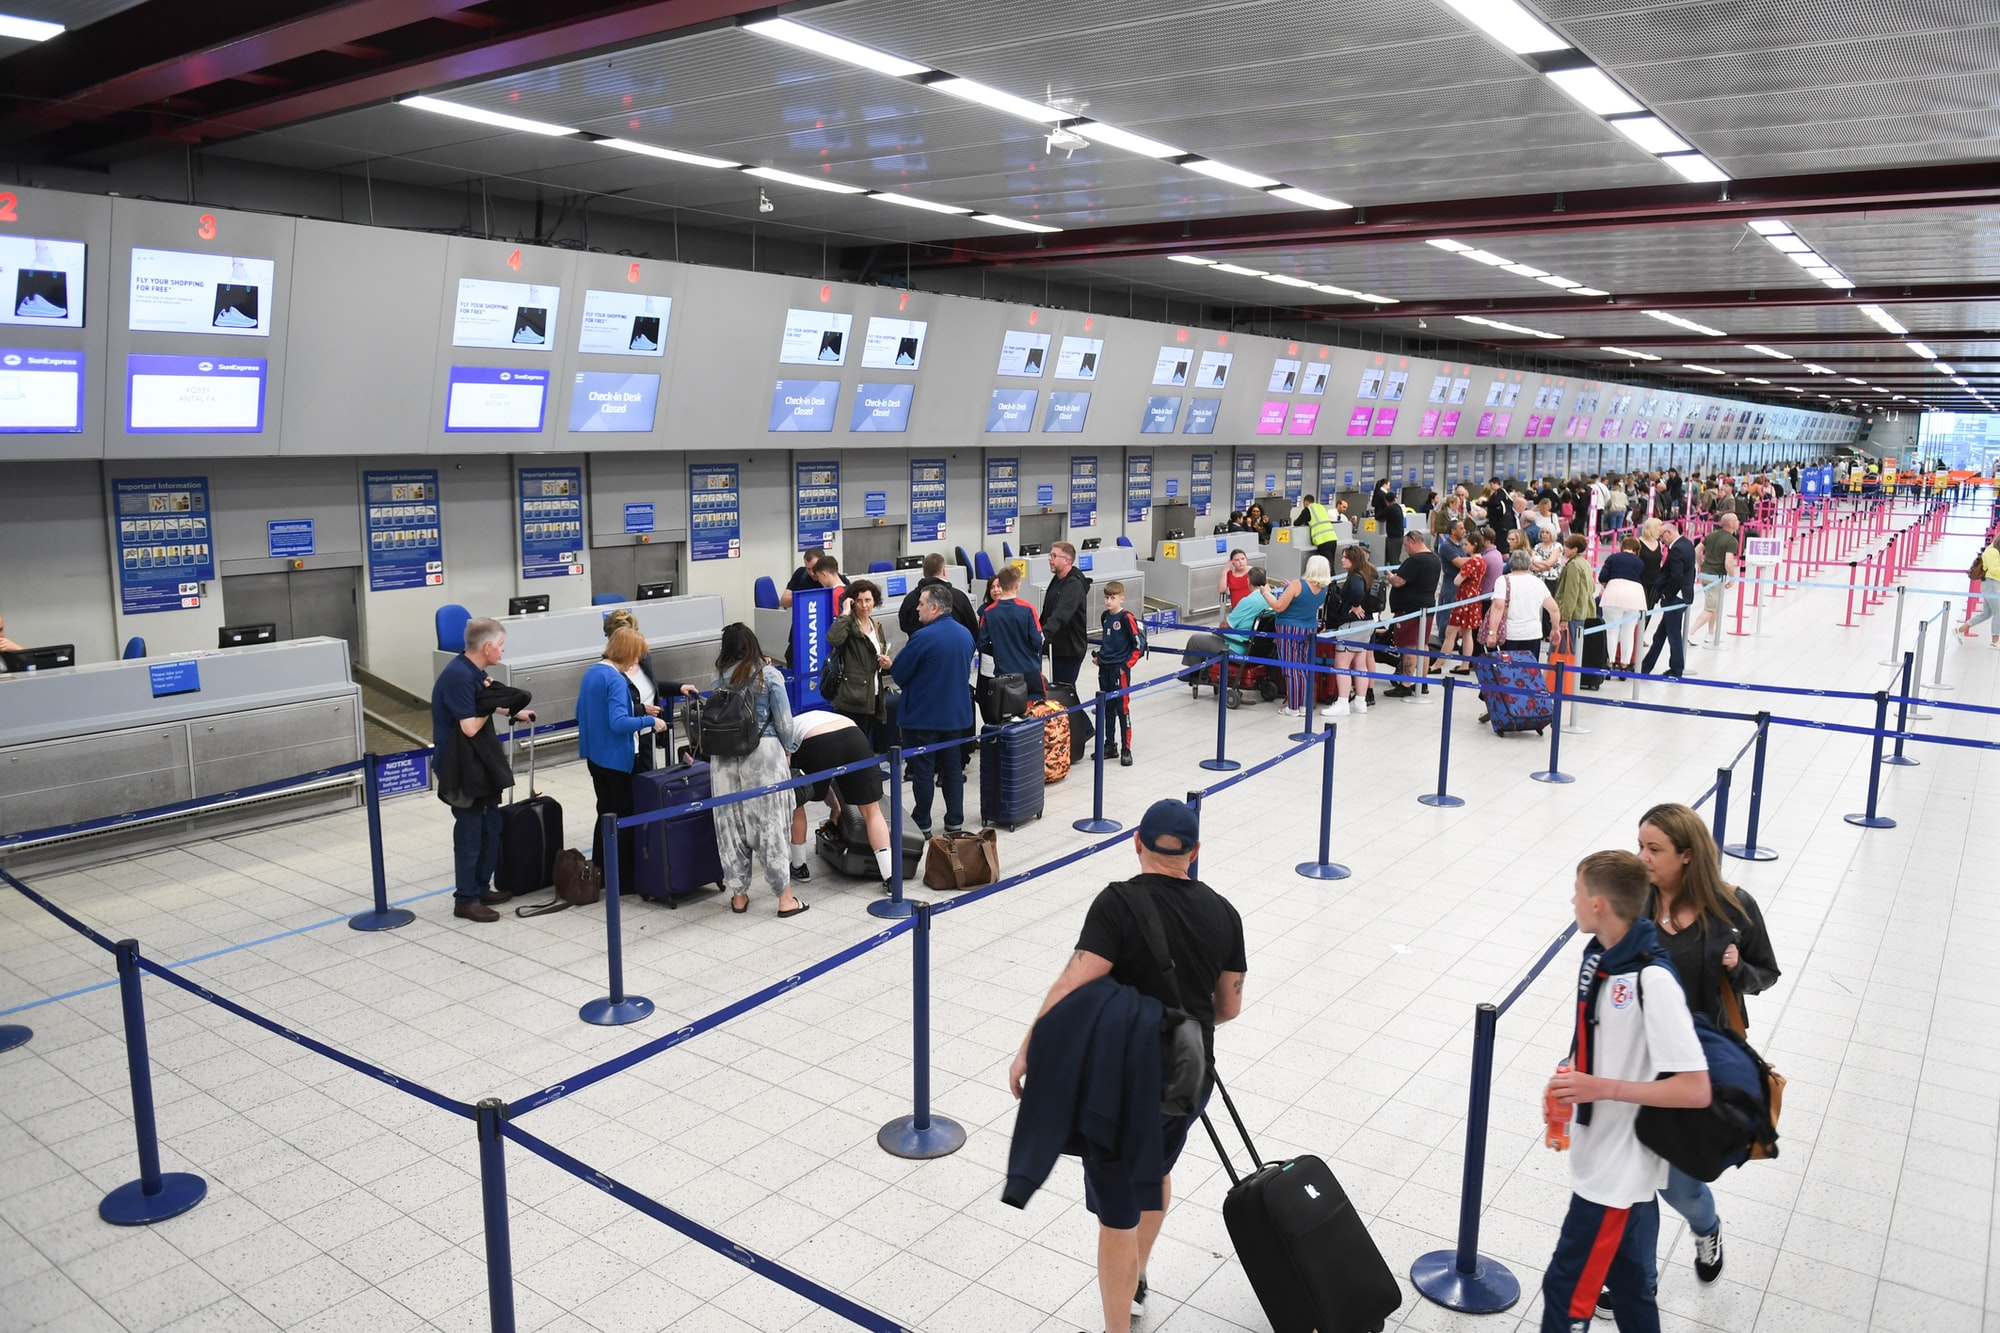 Australia to open international lines with Digital Passenger Declaration